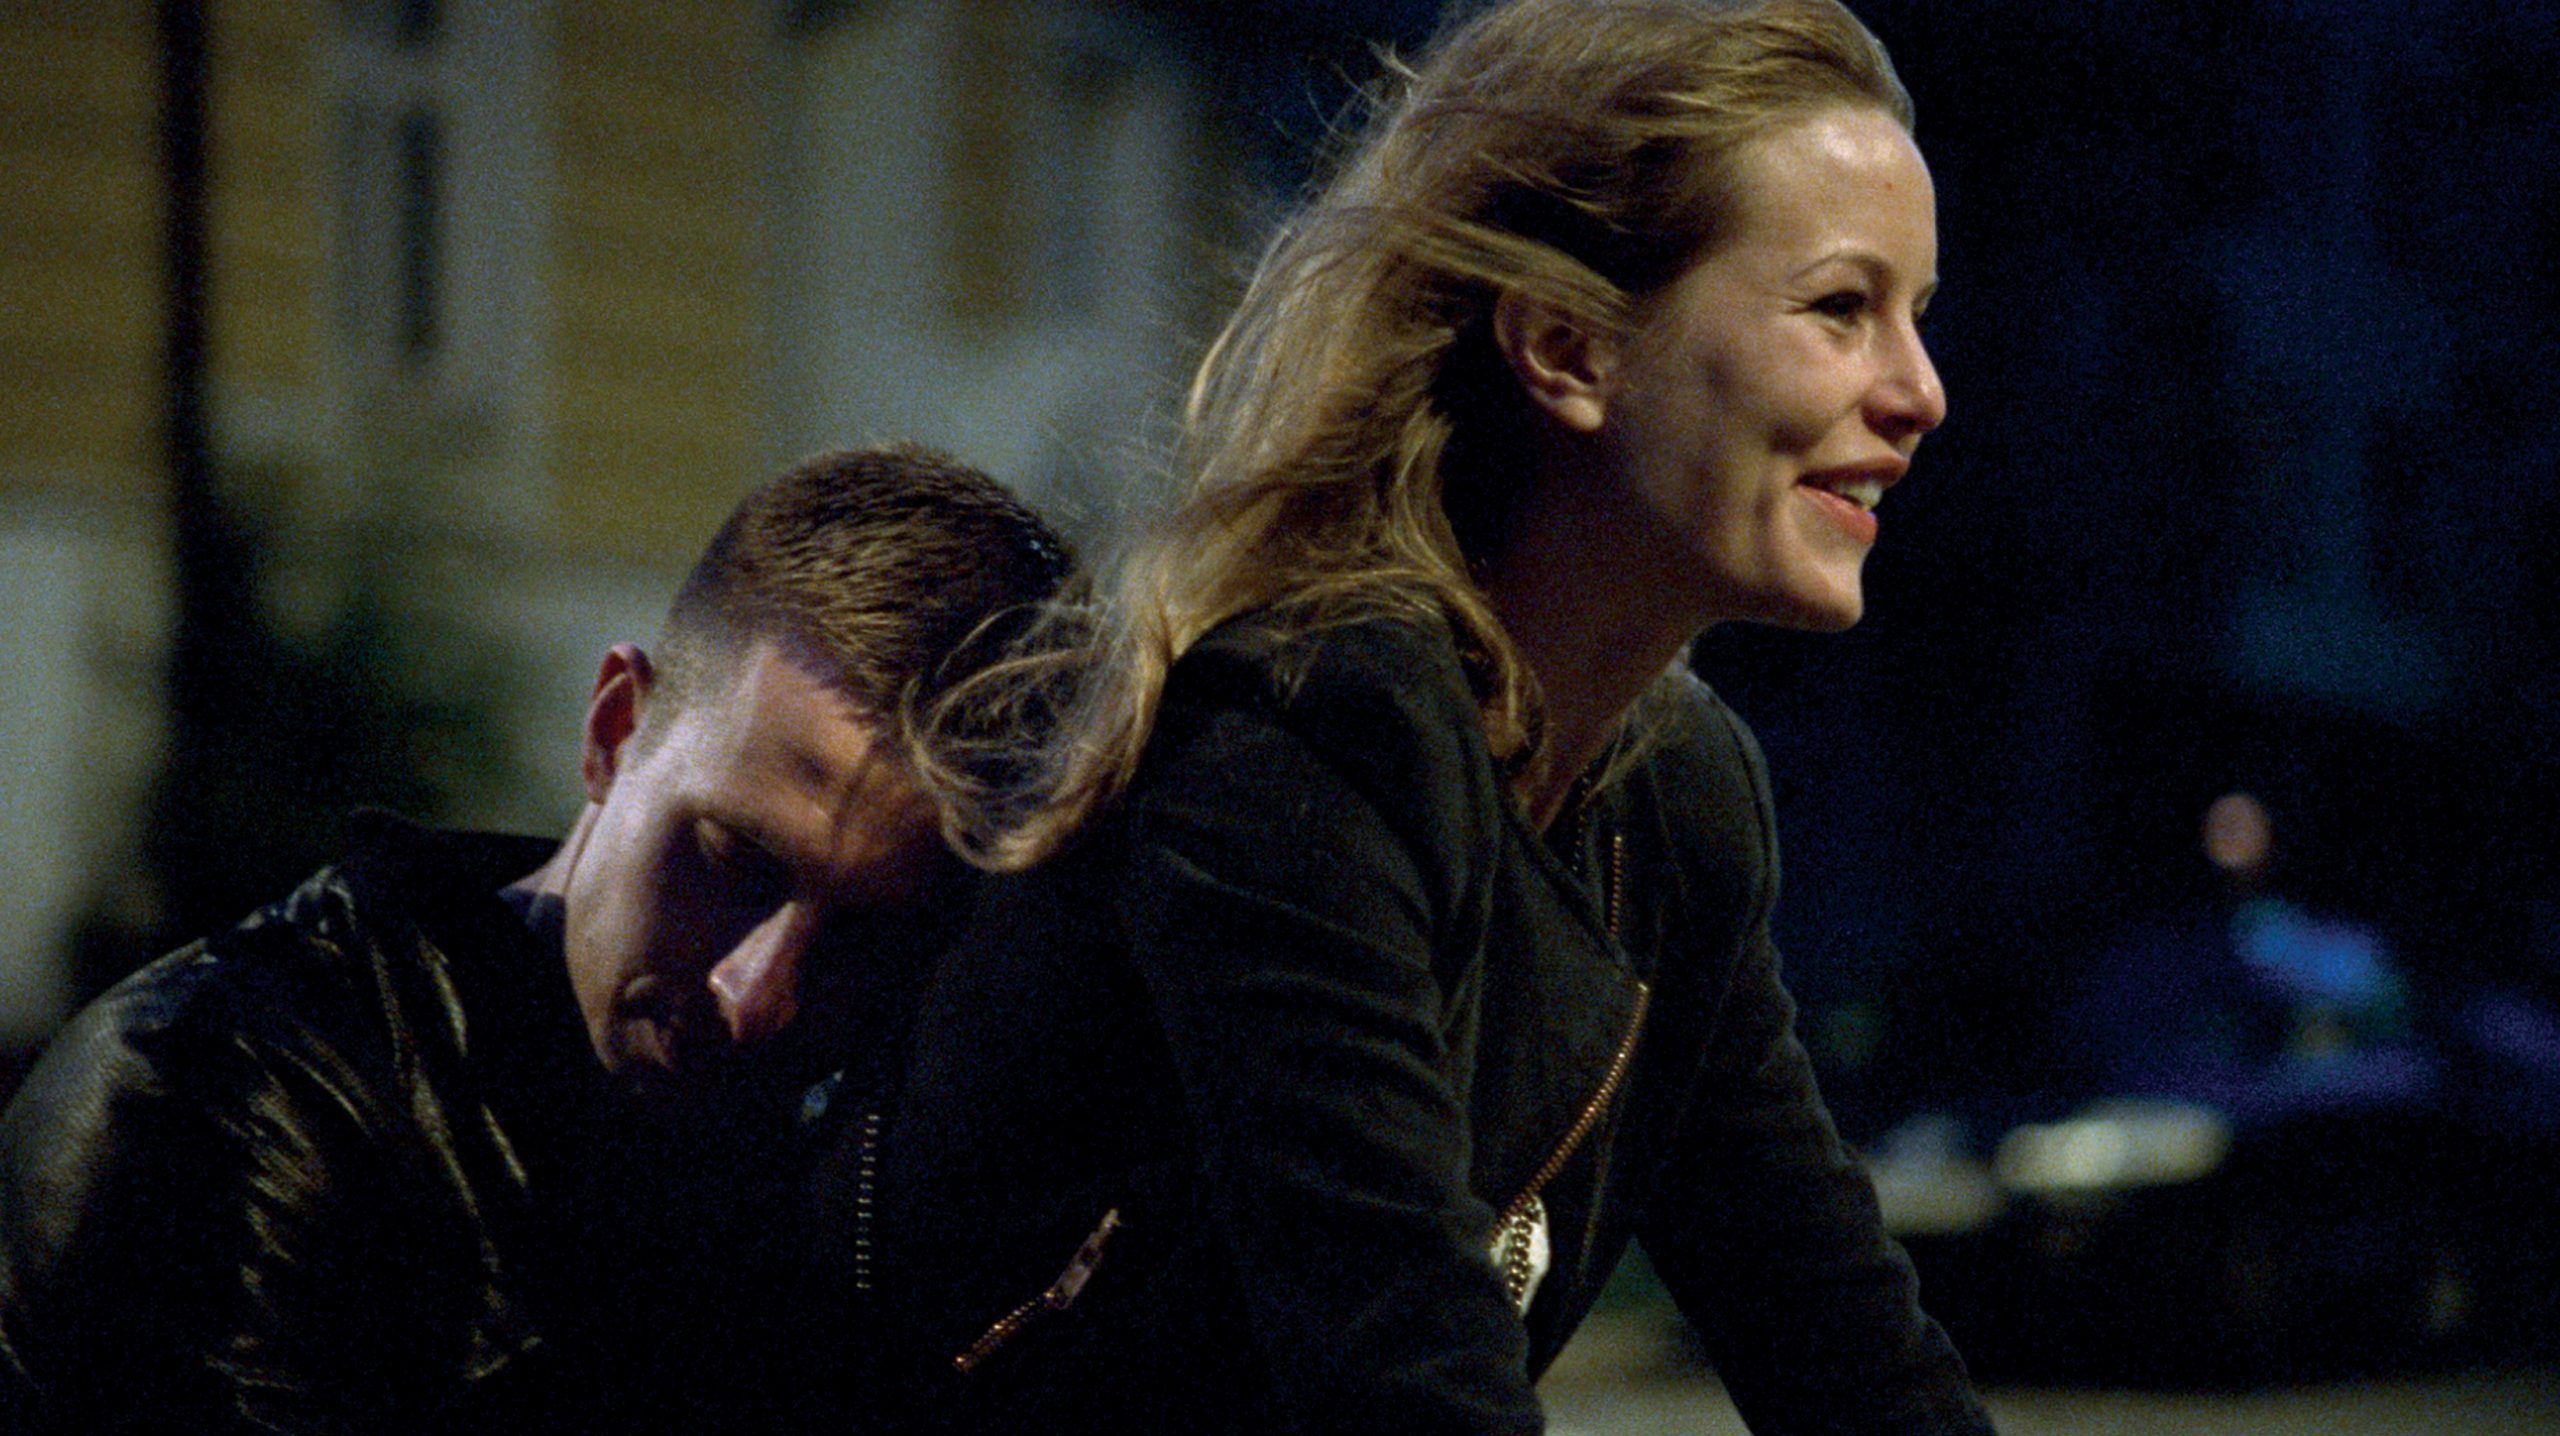 Filmska recenzija iz serije filmova kina Europa: Oslo, 31. kolovoza – Novi 'Novi val'